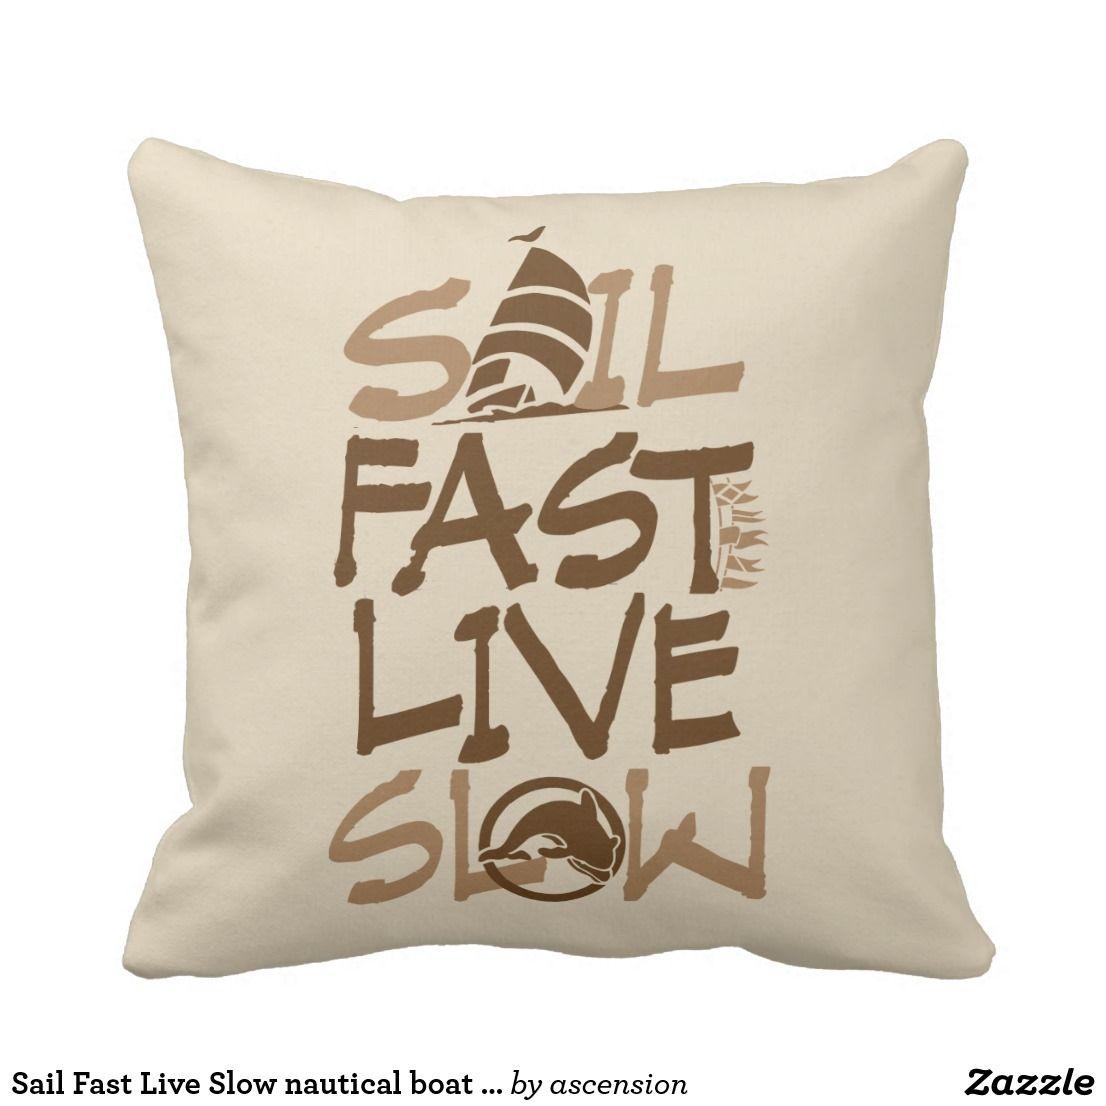 Sail fast live slow nautical boat pillow sailfaster shop at zazzle